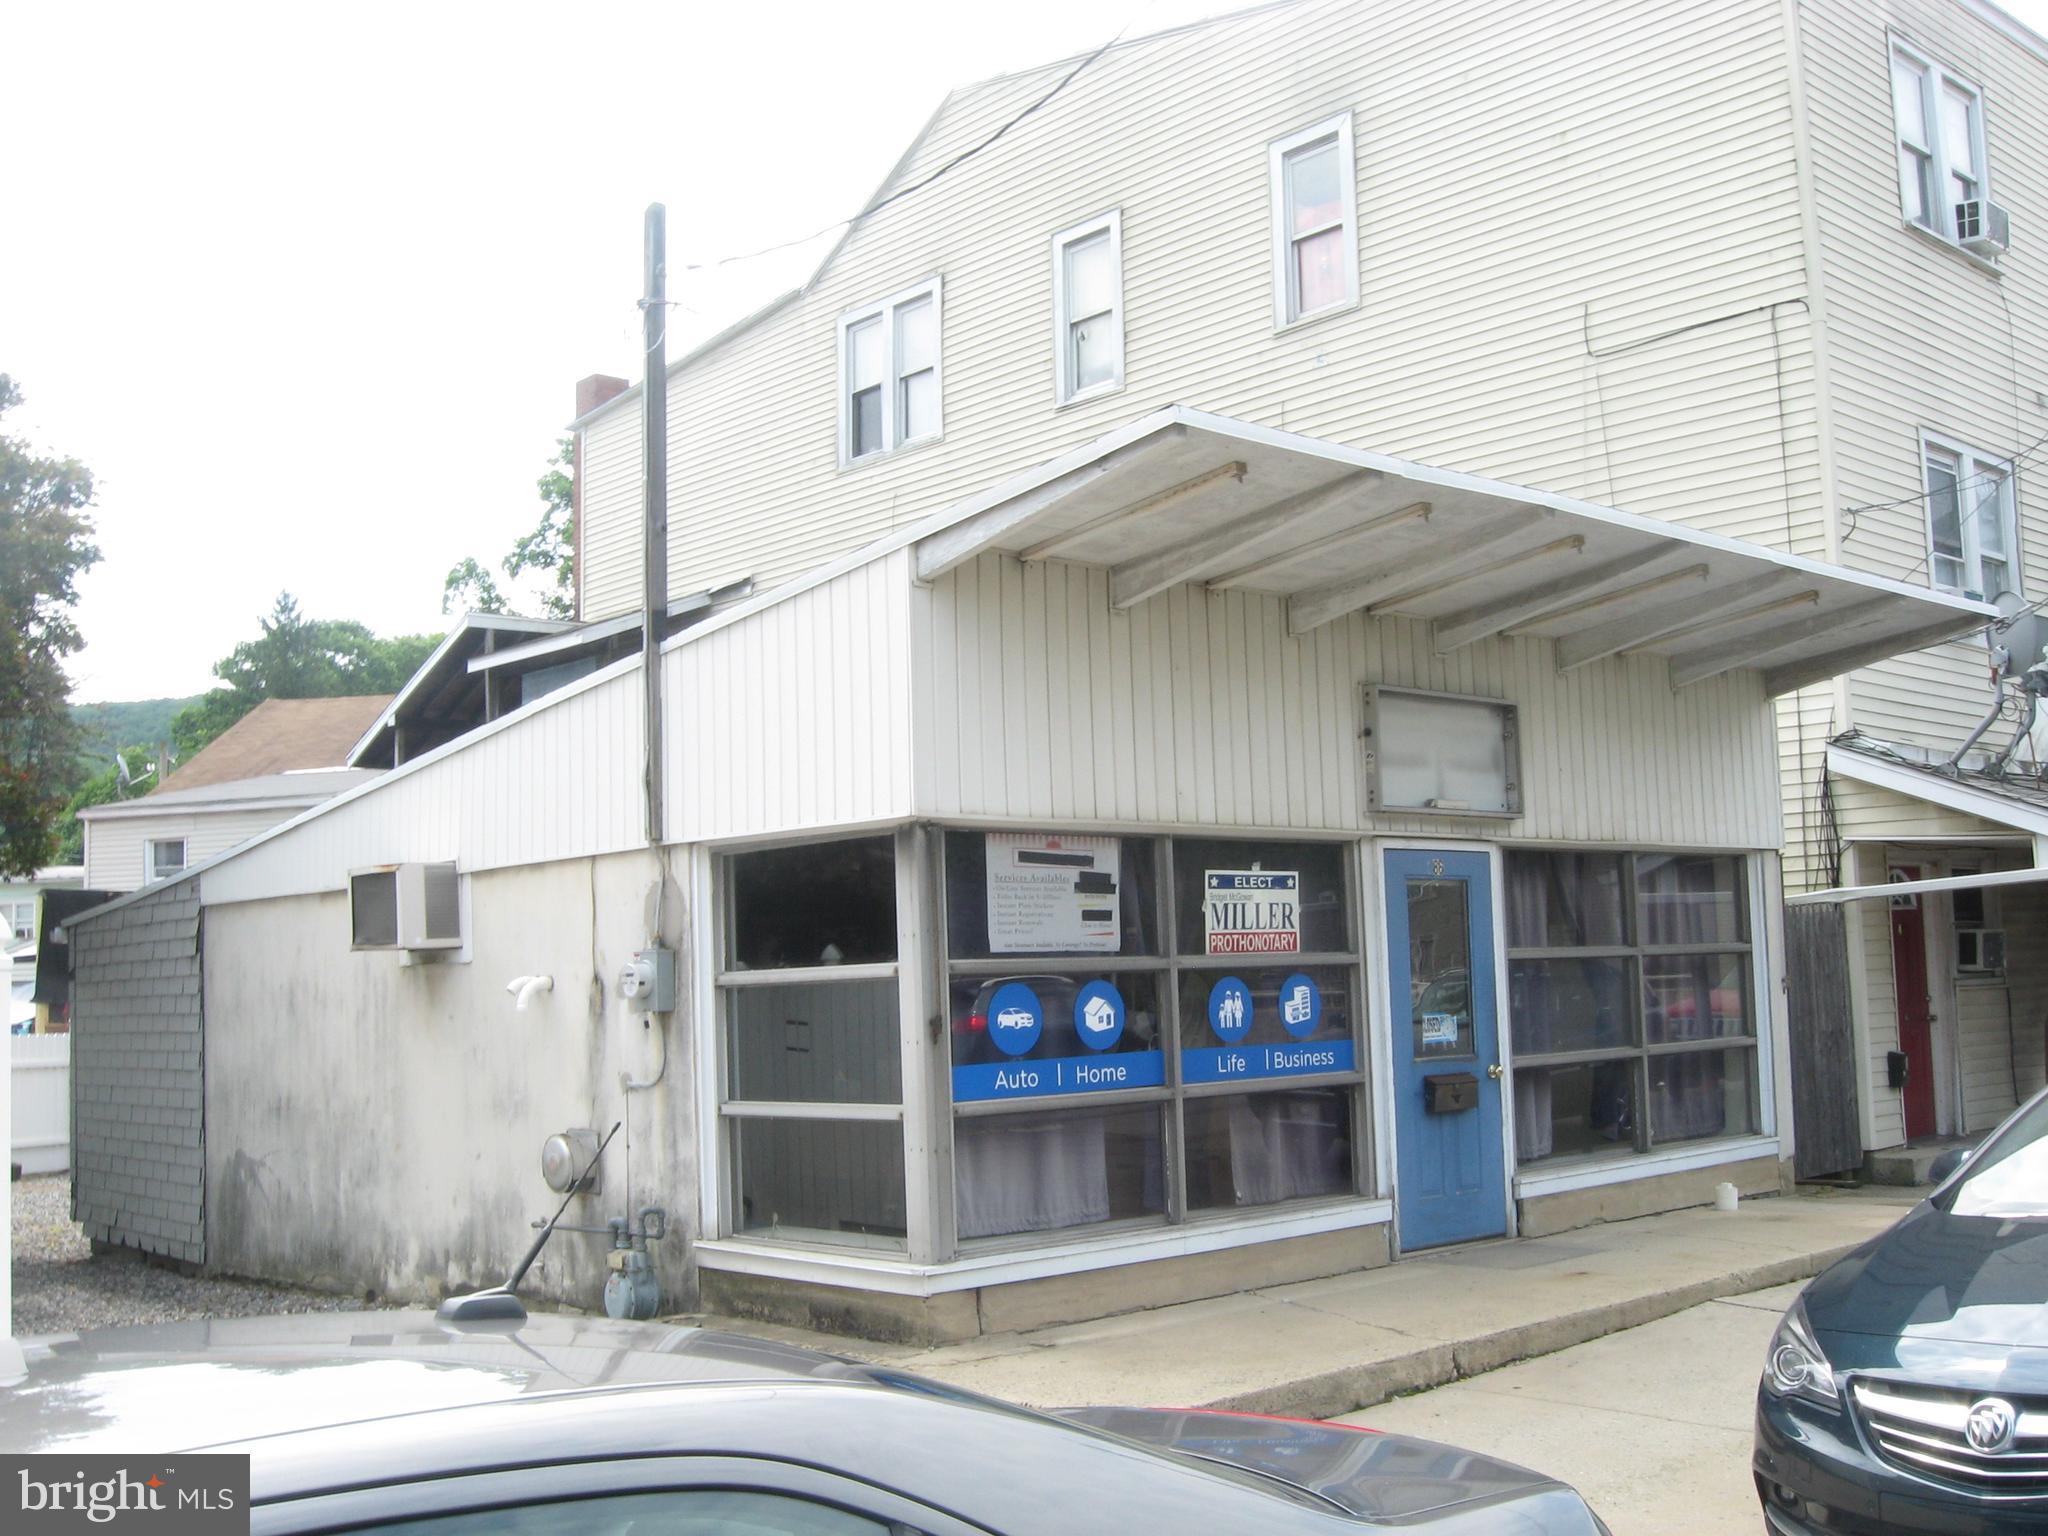 86 COAL STREET, PORT CARBON, PA 17965